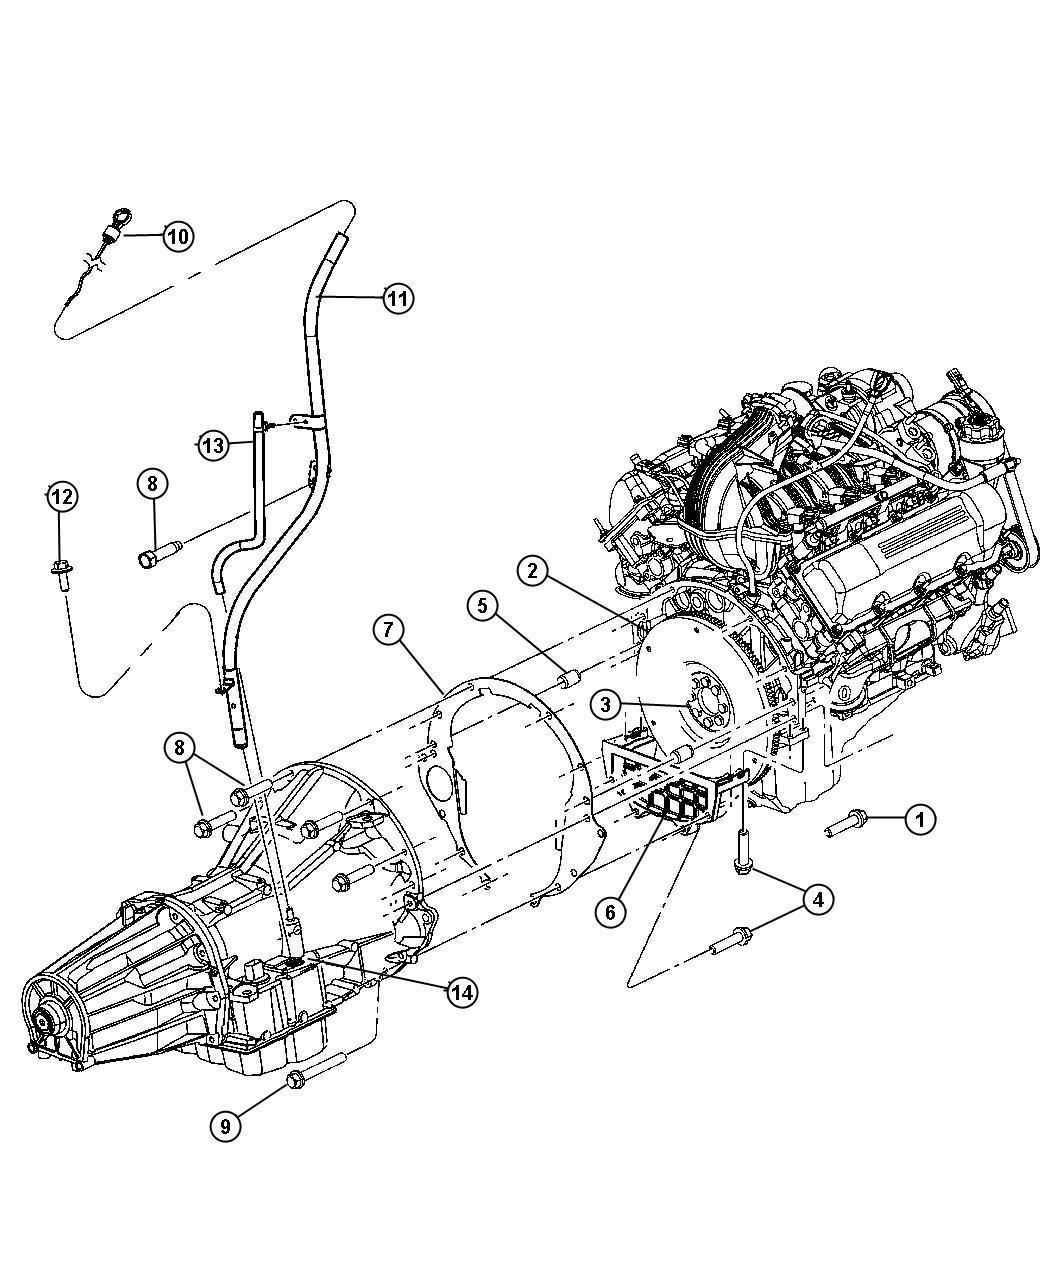 Jeep Liberty Indicator Transmission Fluid Level